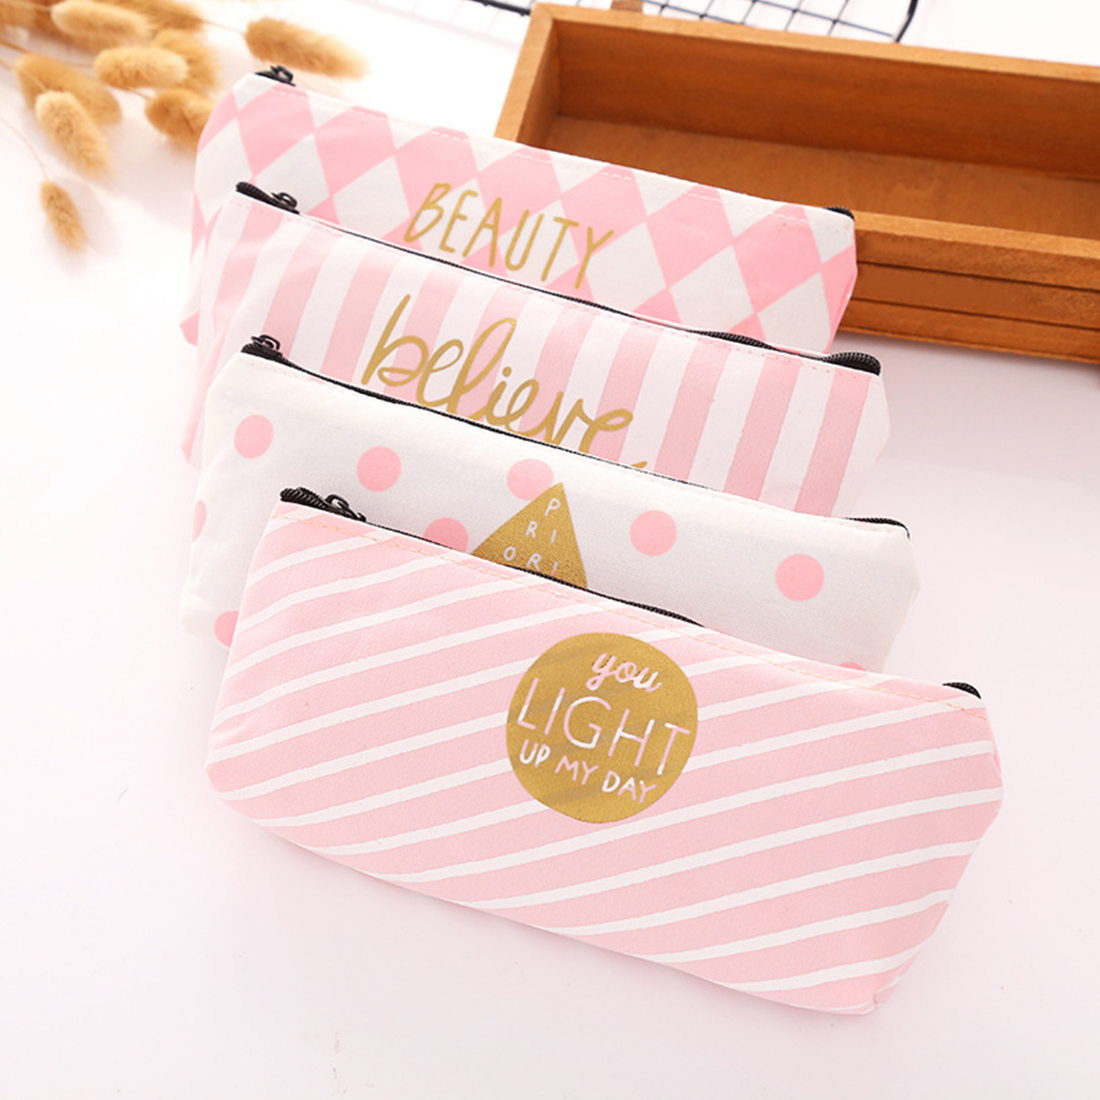 FangNymph Kawaii Pink Stripe Case Canvas Pencil Bag School Supplies Stationery Material Pencil Case 20*8*4cm Girl Pencil Bag